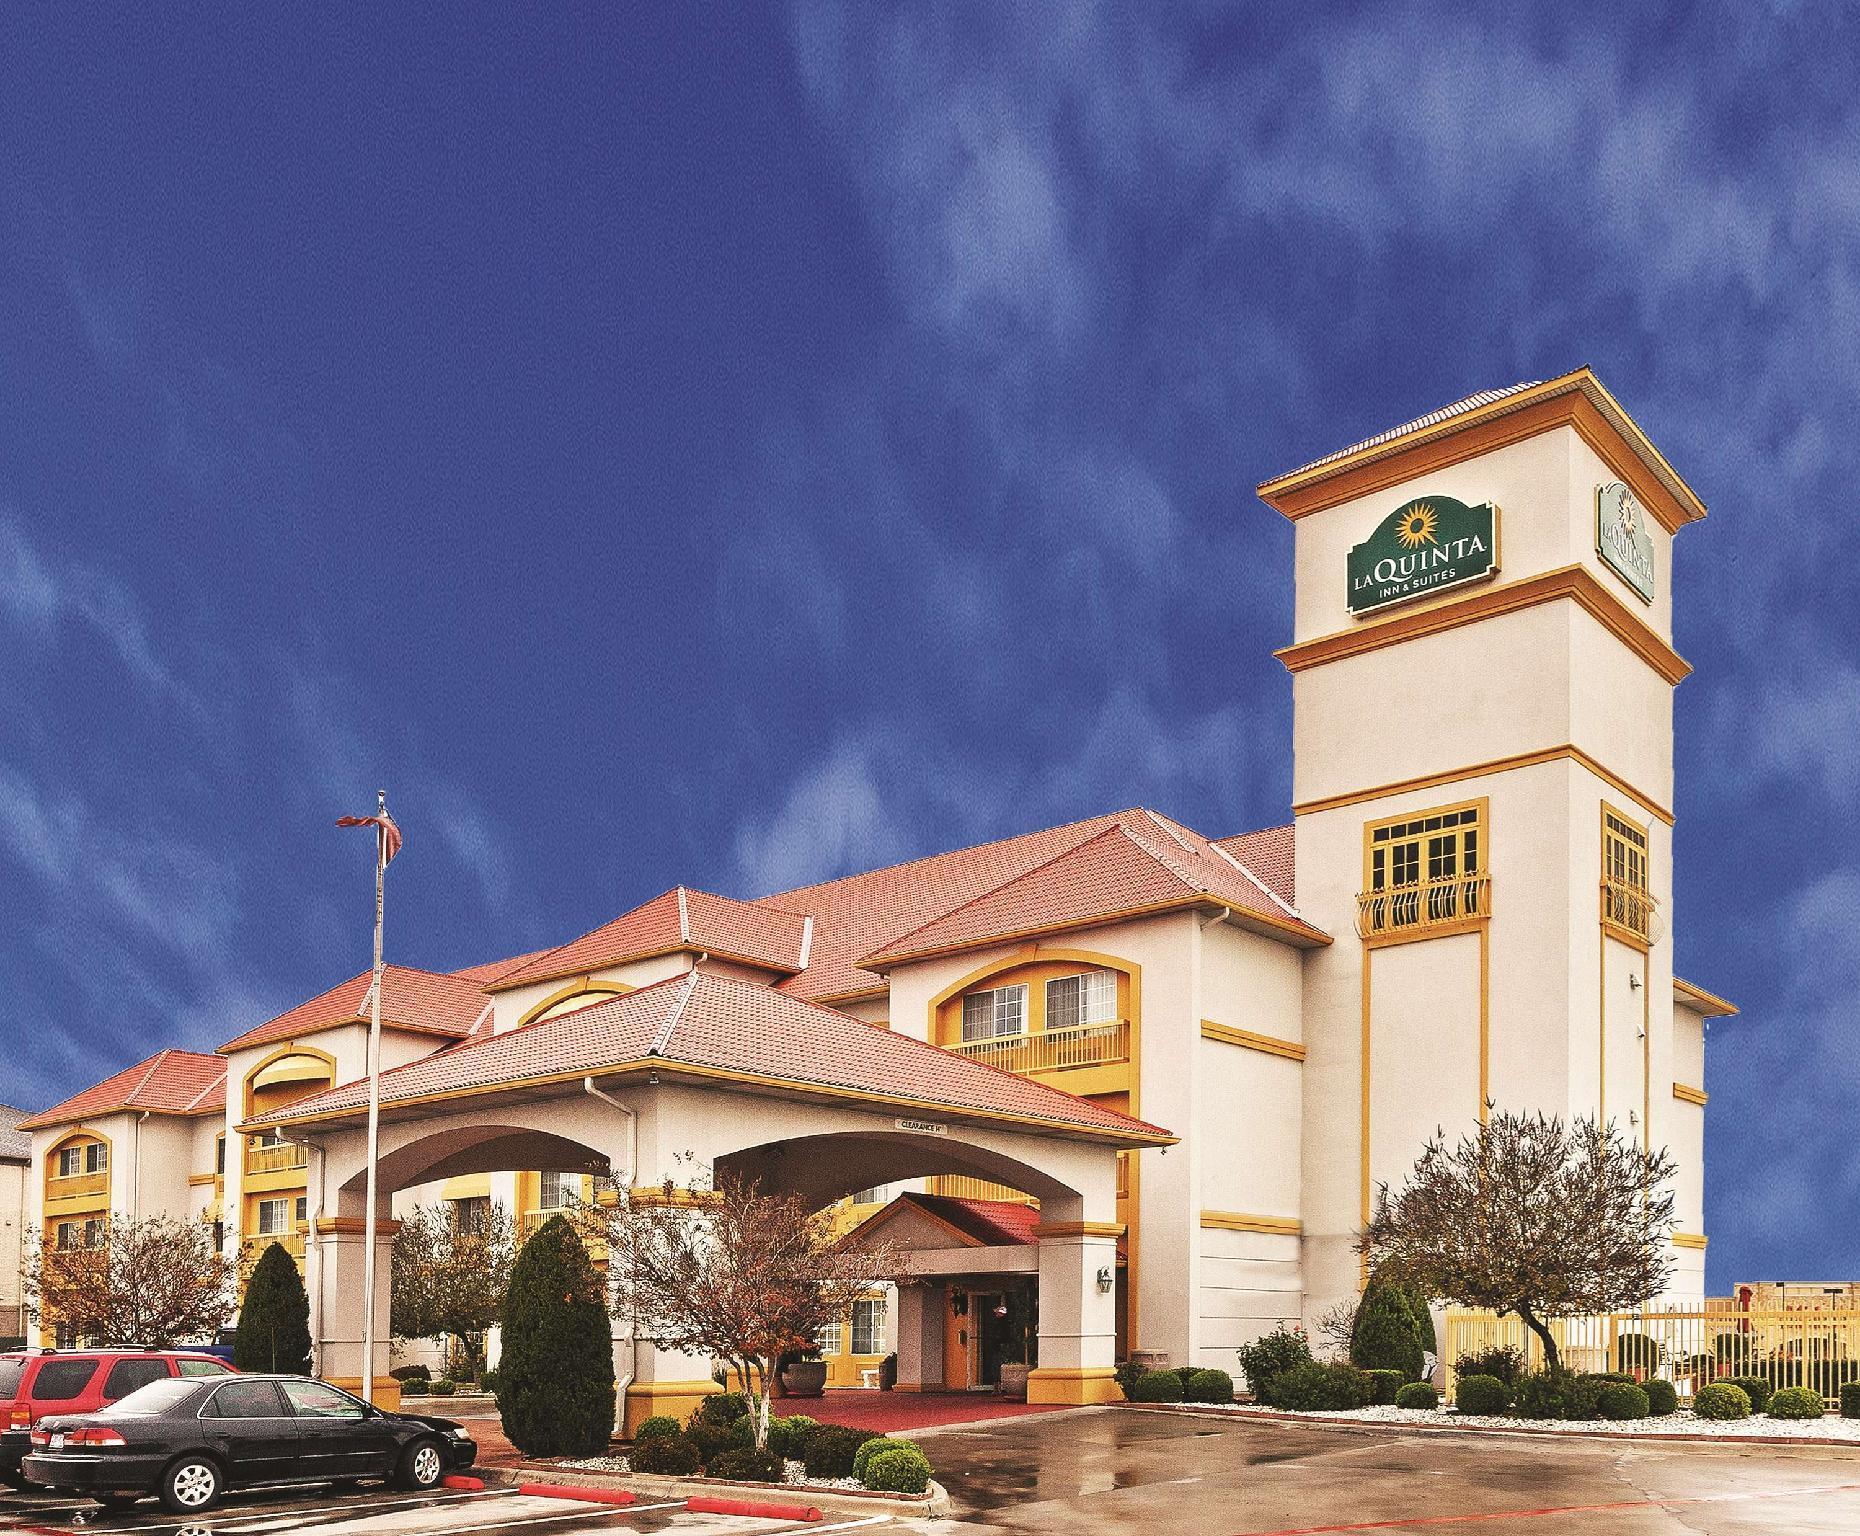 La Quinta Inn And Suites By Wyndham Weatherford